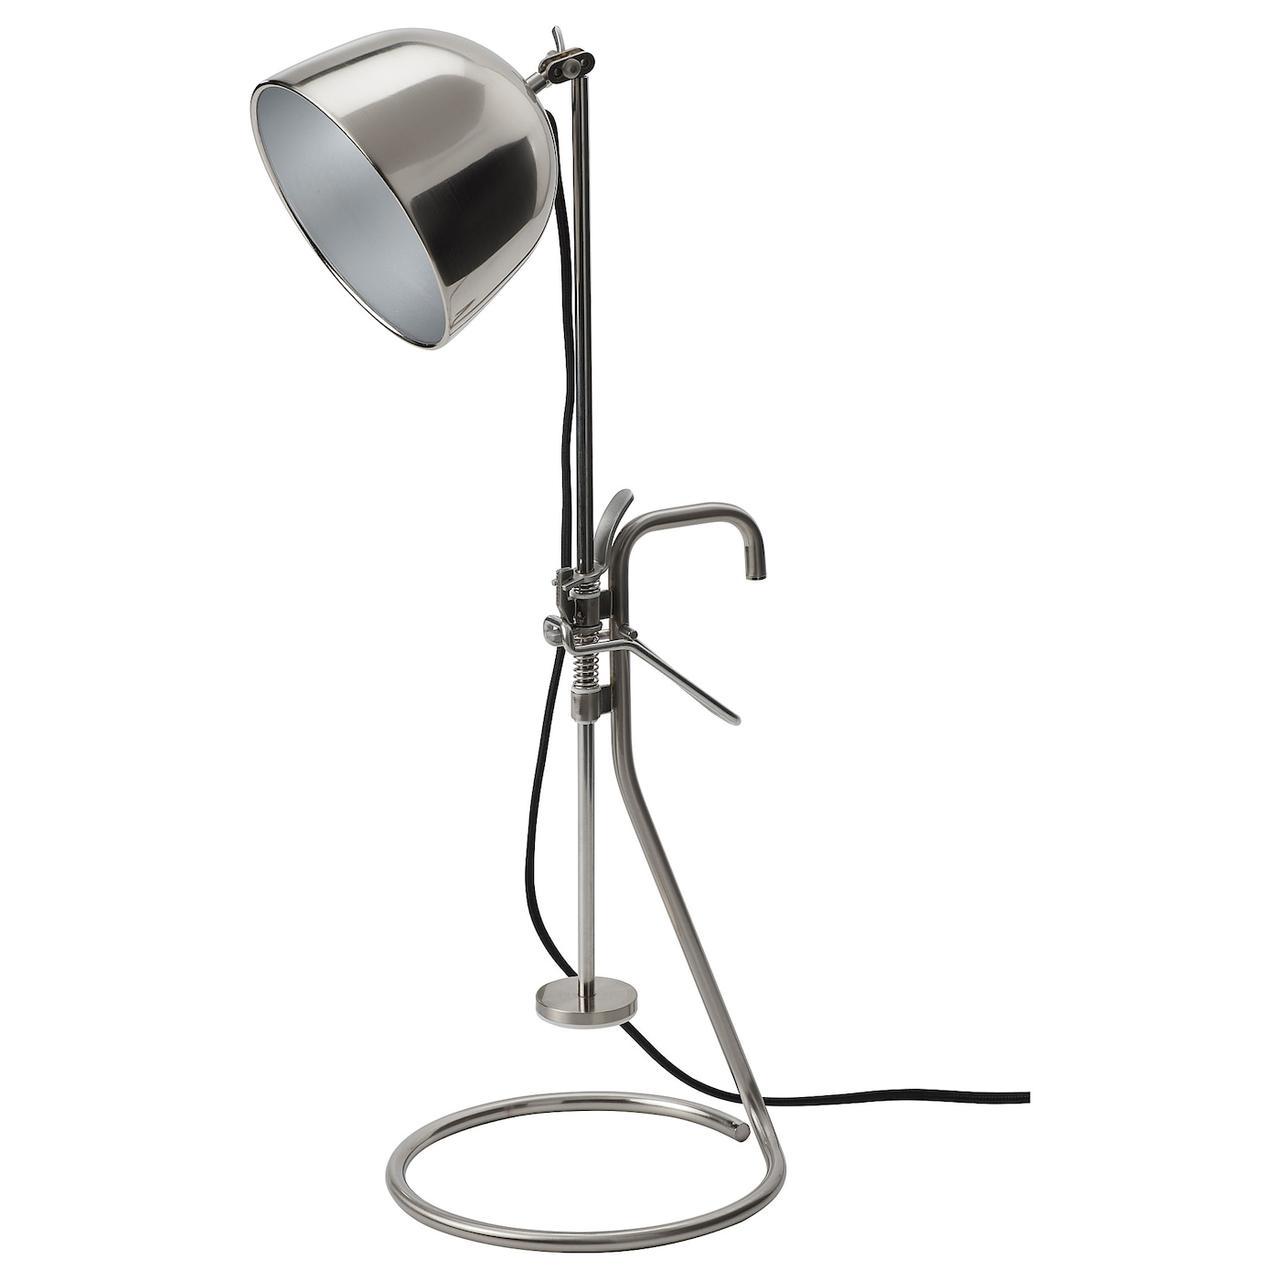 IKEA RÅVAROR Настольная лампа с зажимом, нержавеющ сталь